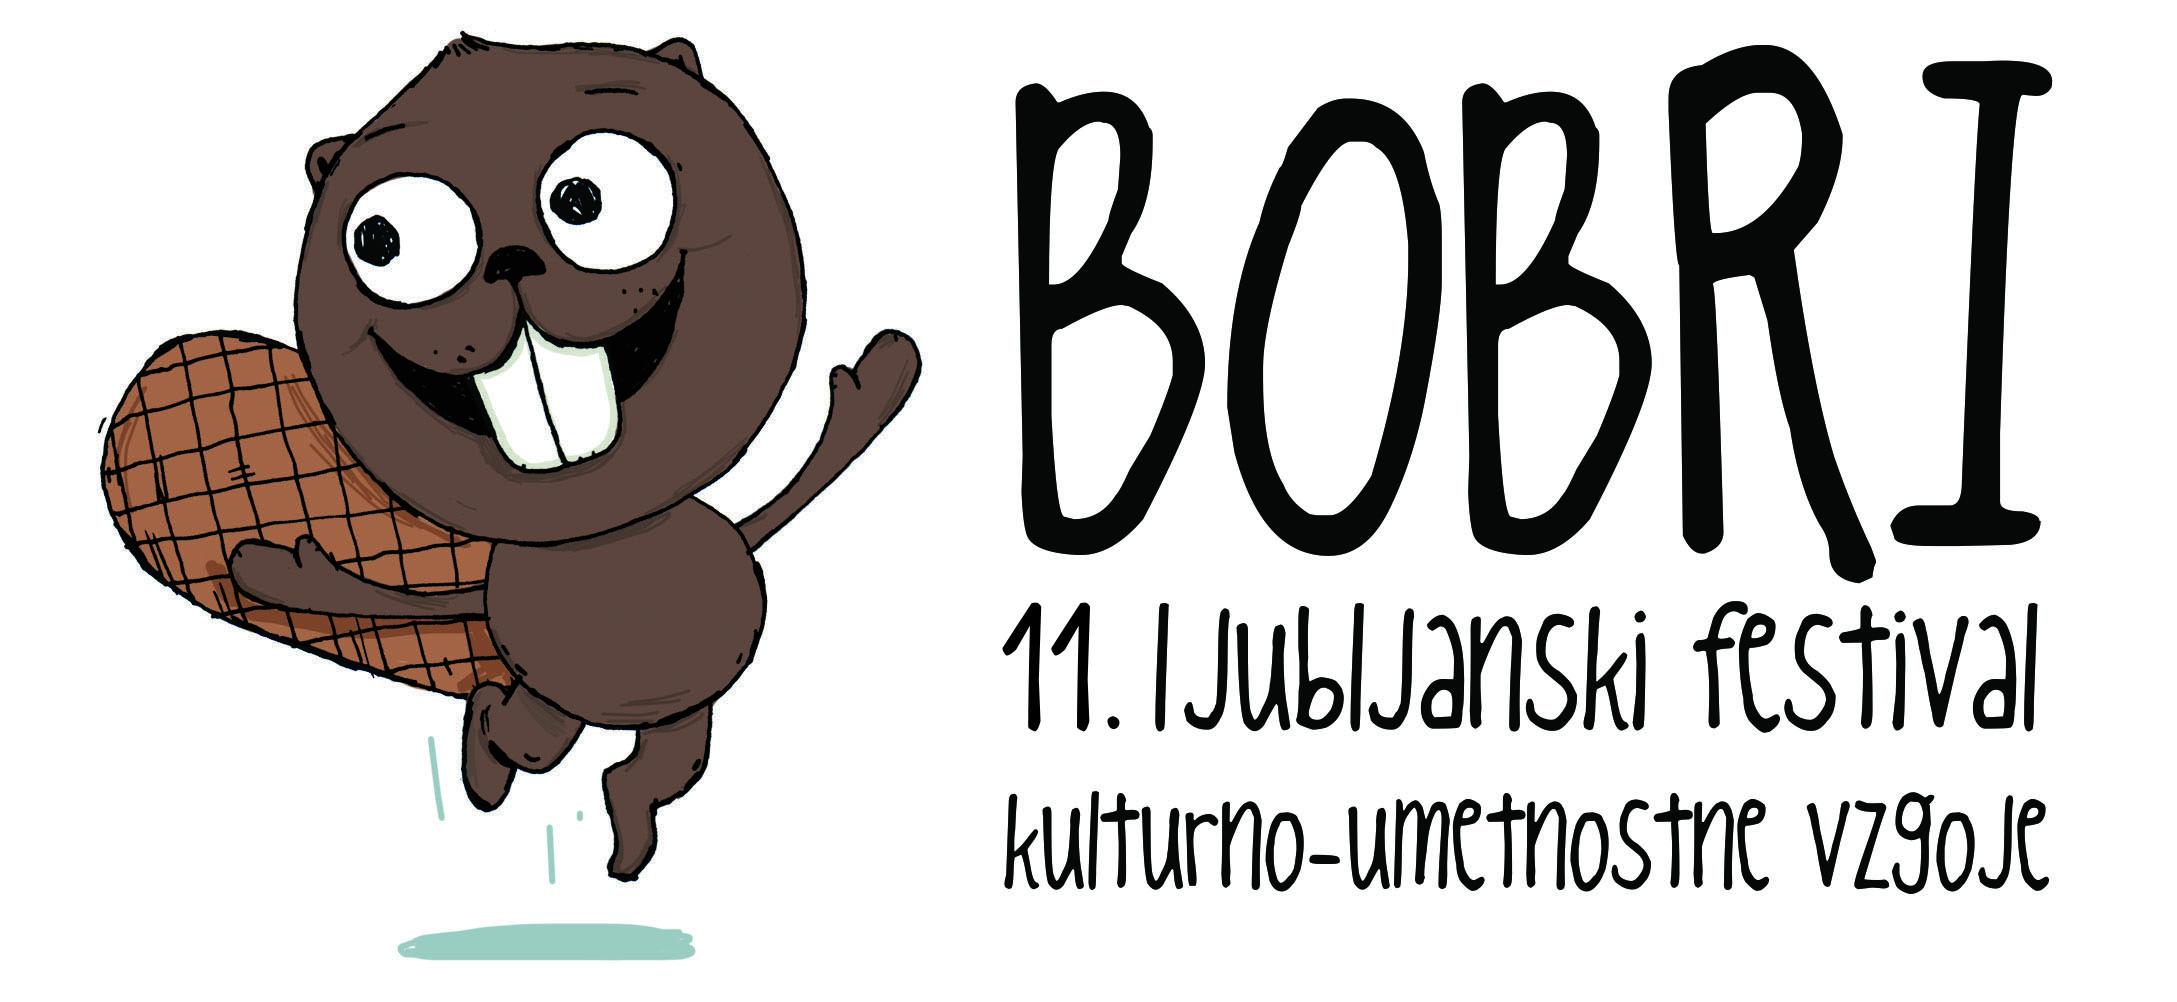 11. Bobri logo.jpg